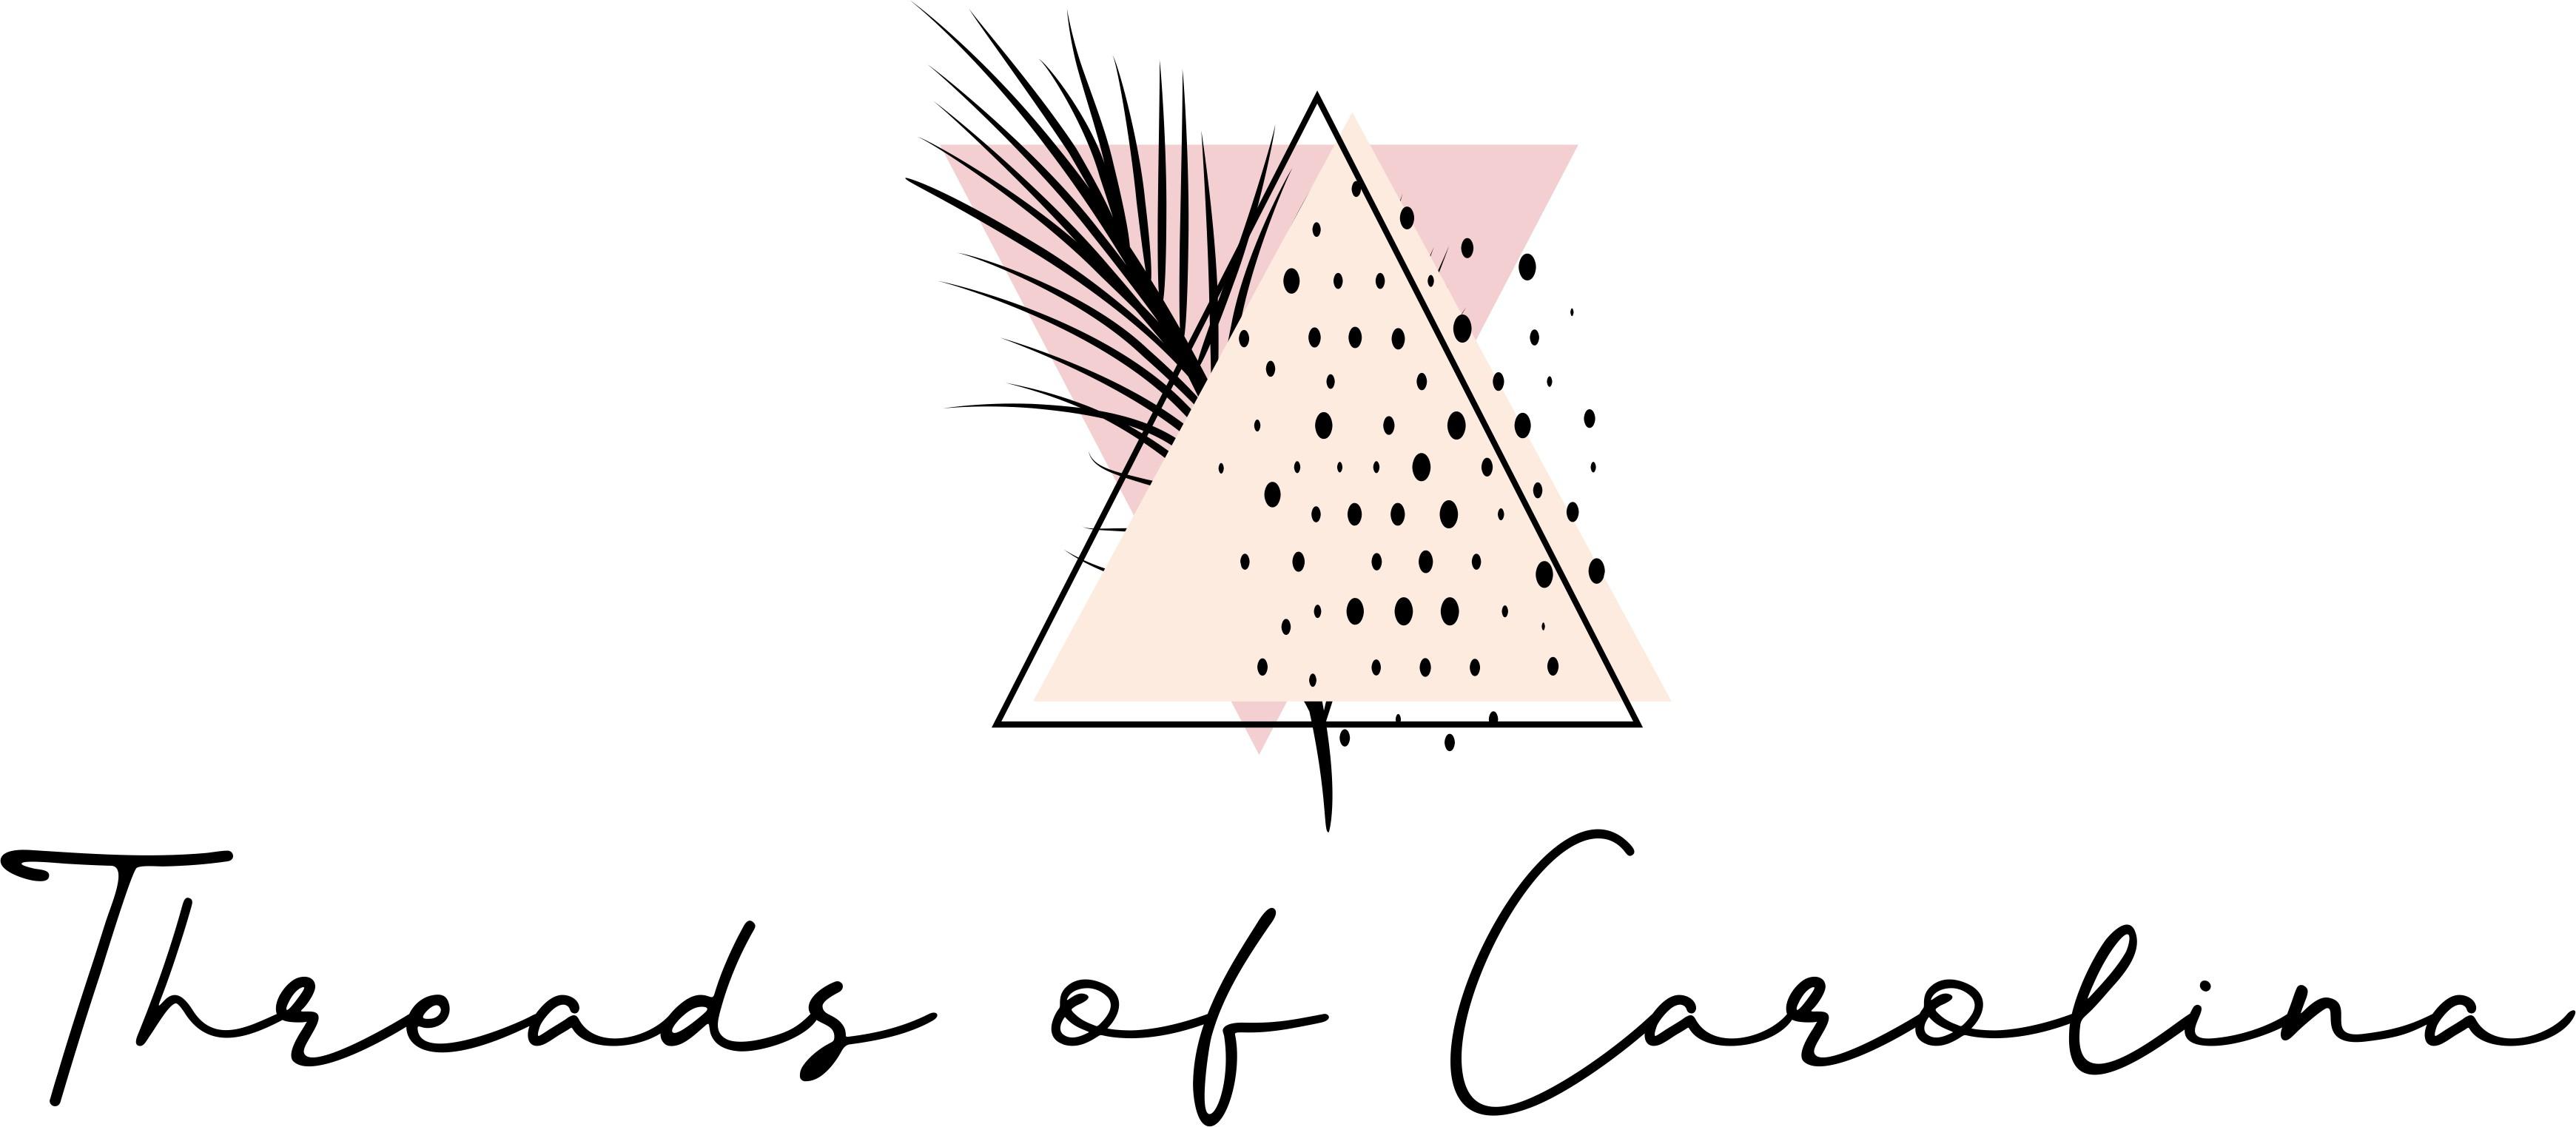 "Design a classically trendy logo for a fashion blog called ""Threads of Carolina"""